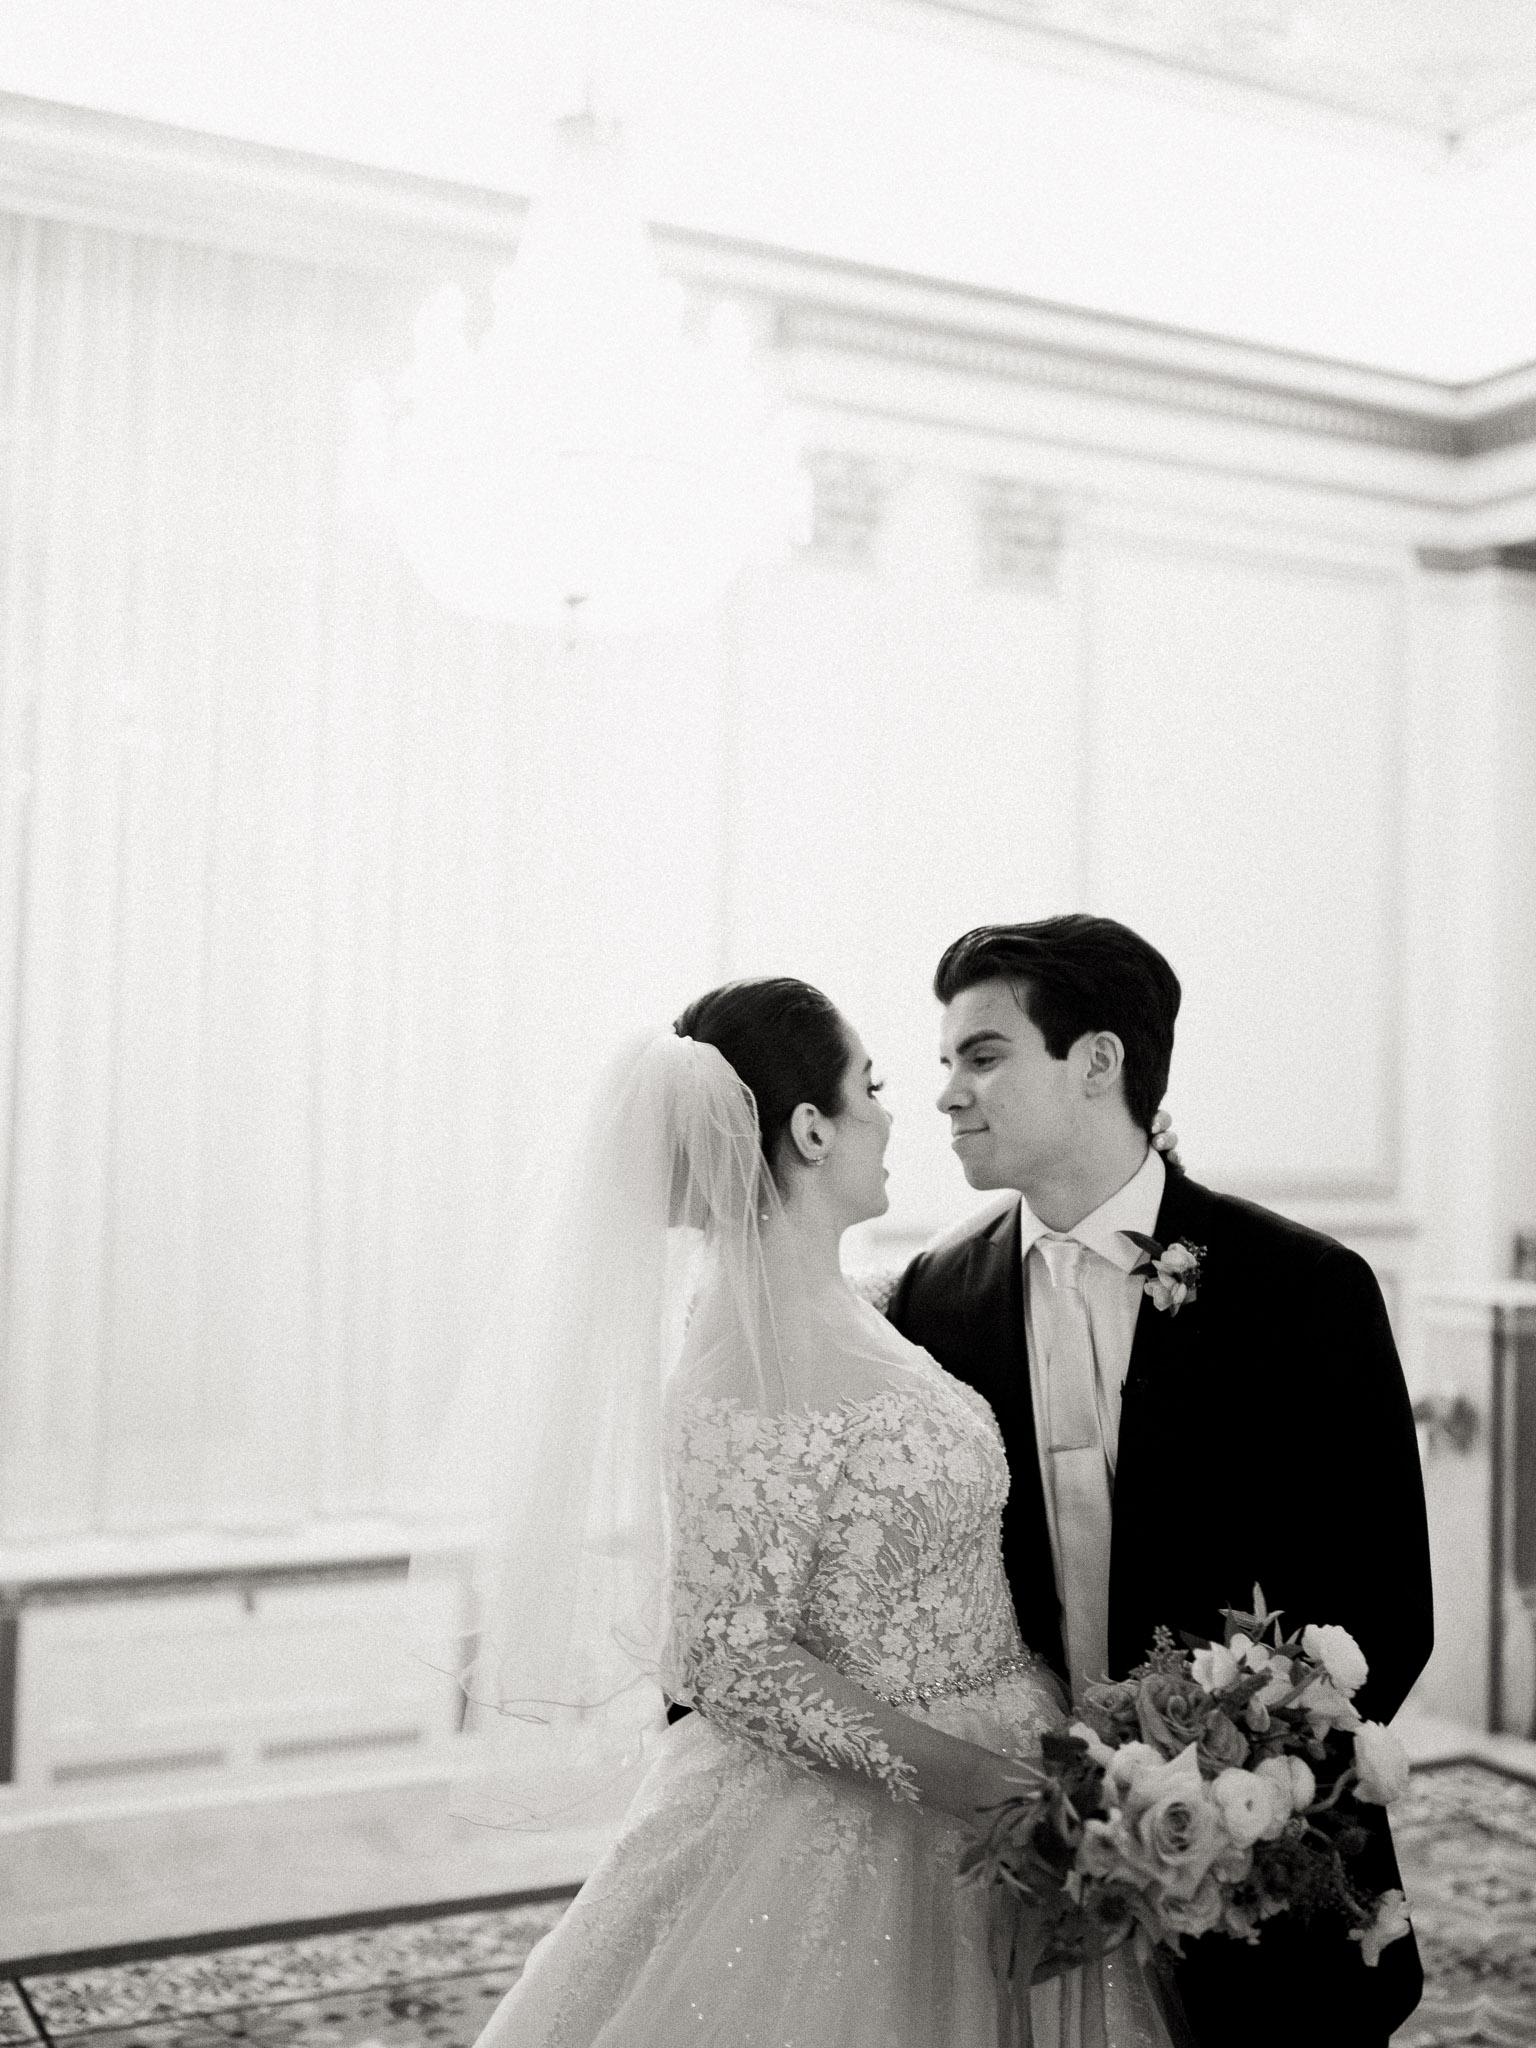 Hanna&Jordan Wedding_HotelVancouver_9450.jpg